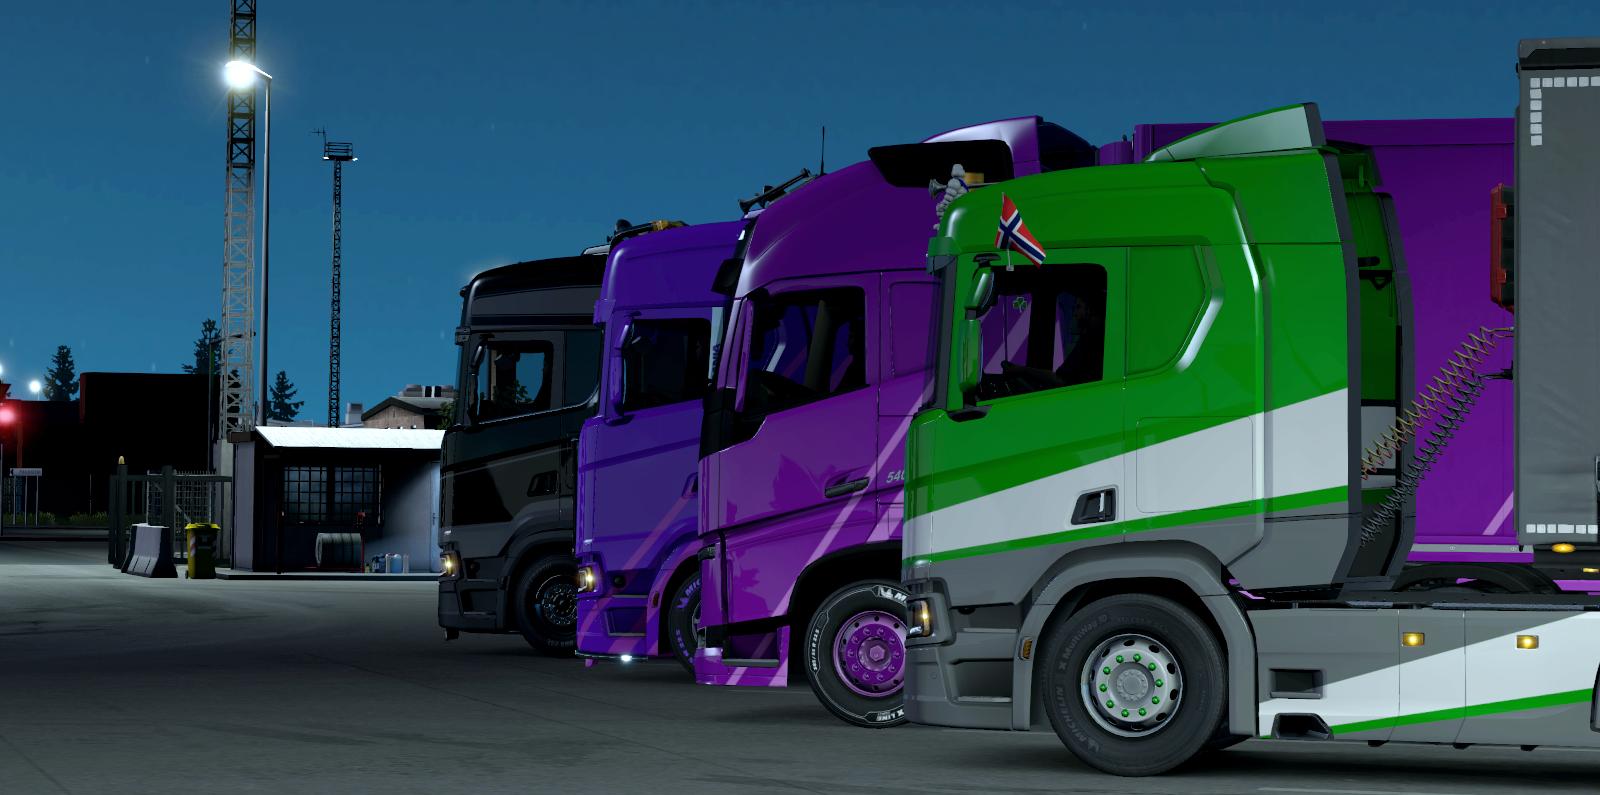 eurotrucks2-2019-03-10-12-23-34.png